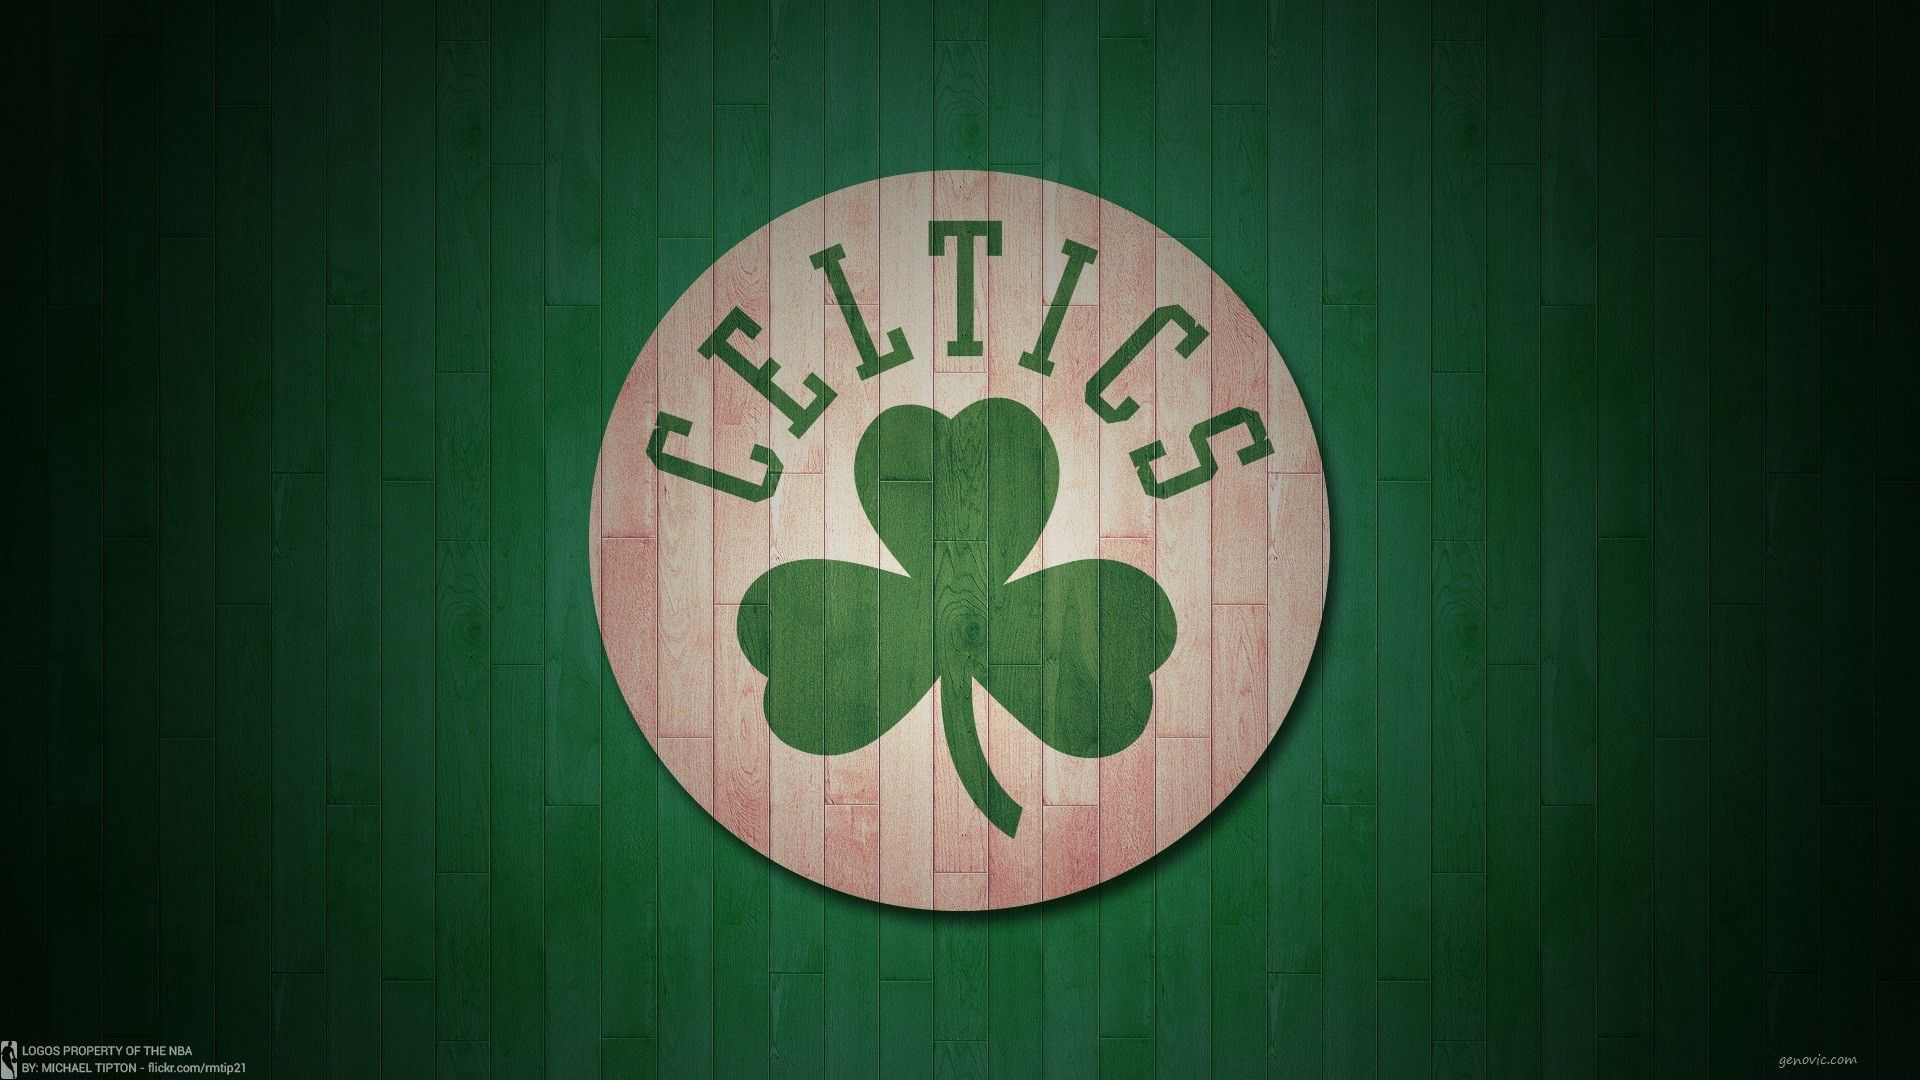 Boston Celtics Wallpapers Top Free Boston Celtics Backgrounds Wallpaperaccess